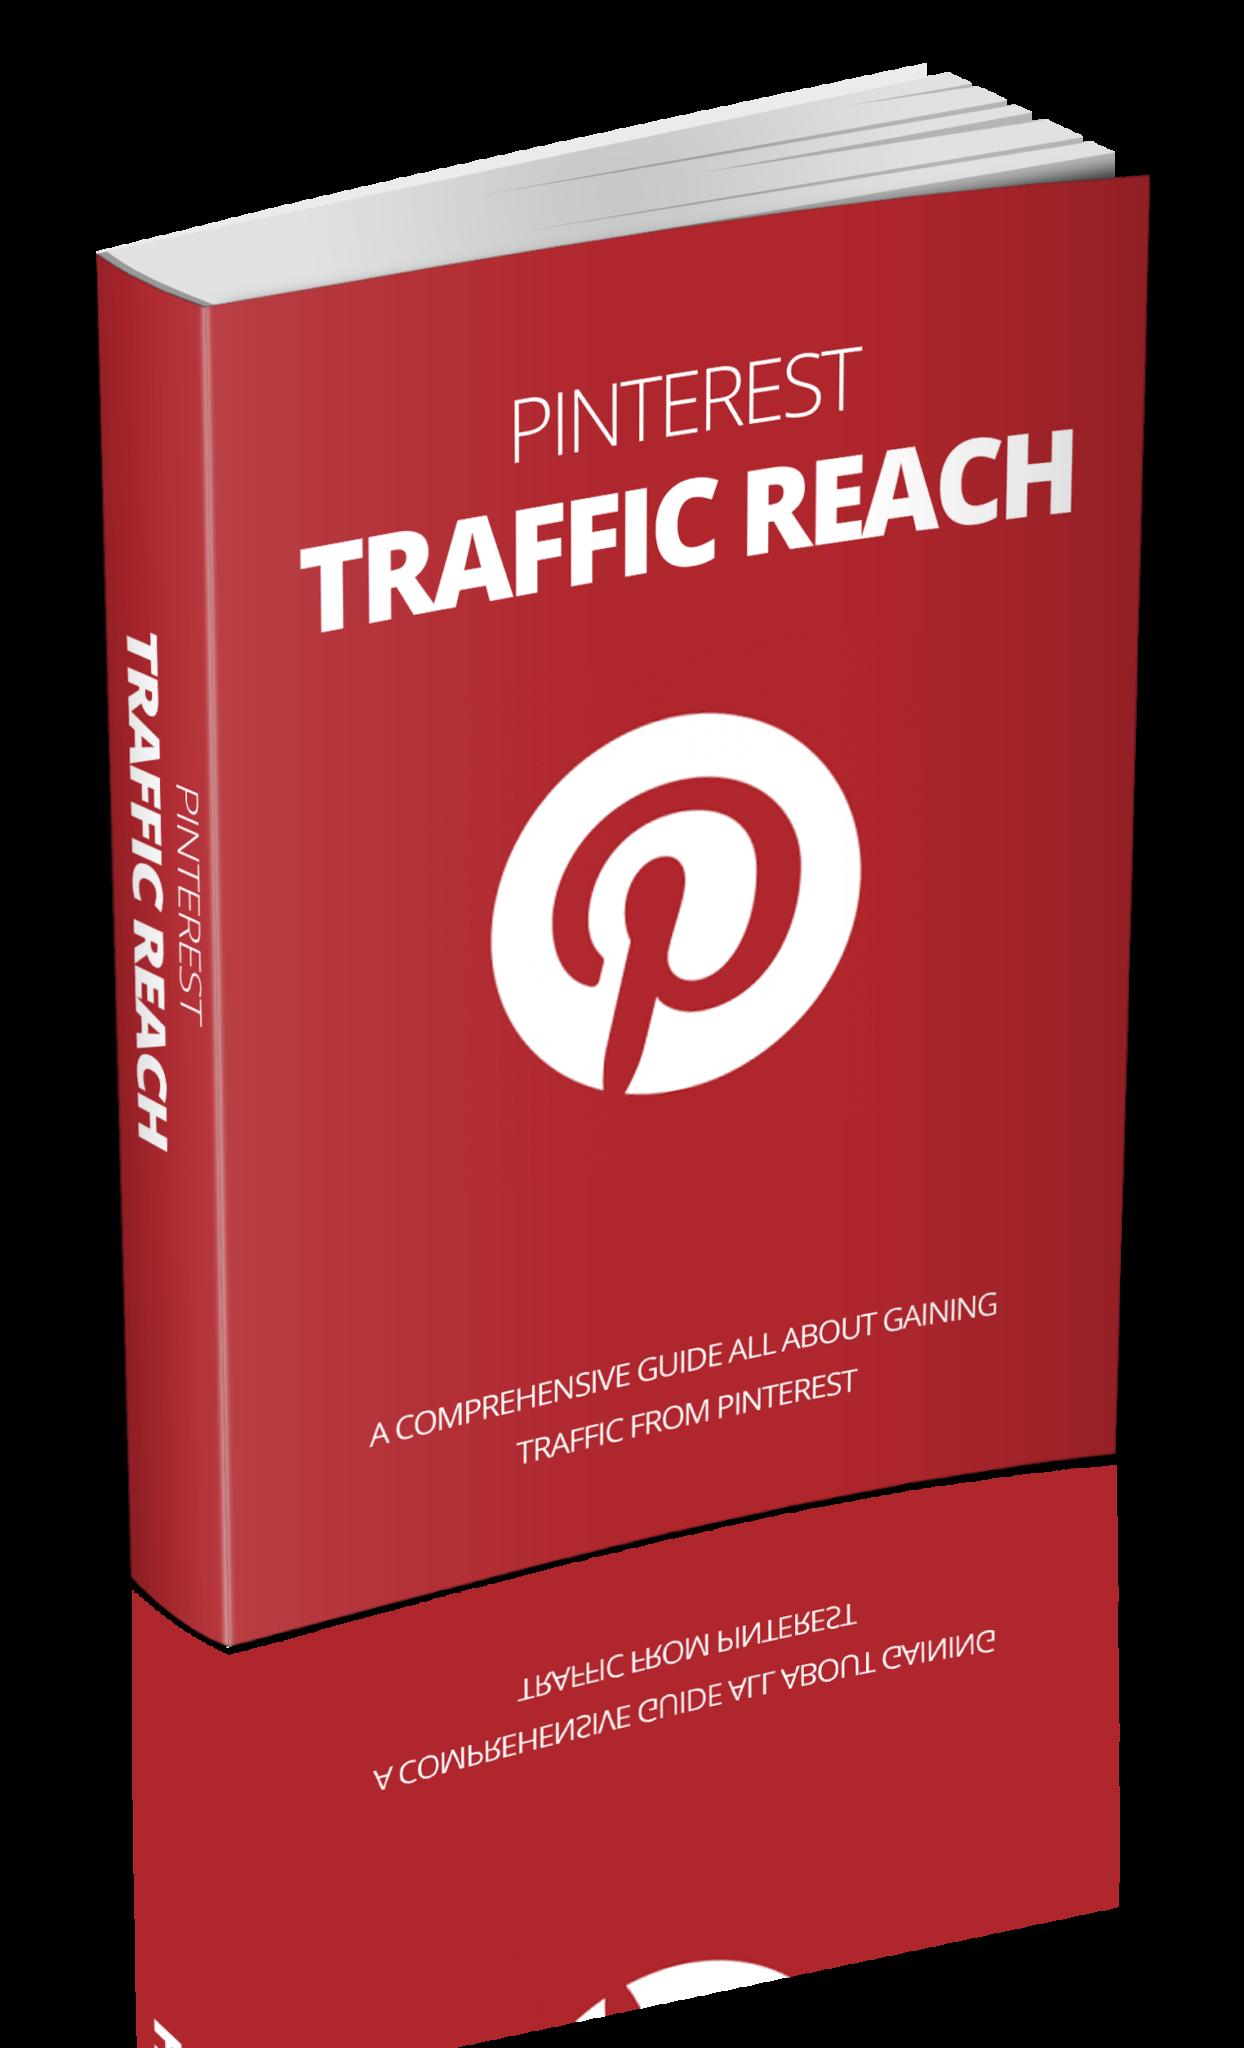 Pinterest Traffic Reach Pinterest Traffic Reach